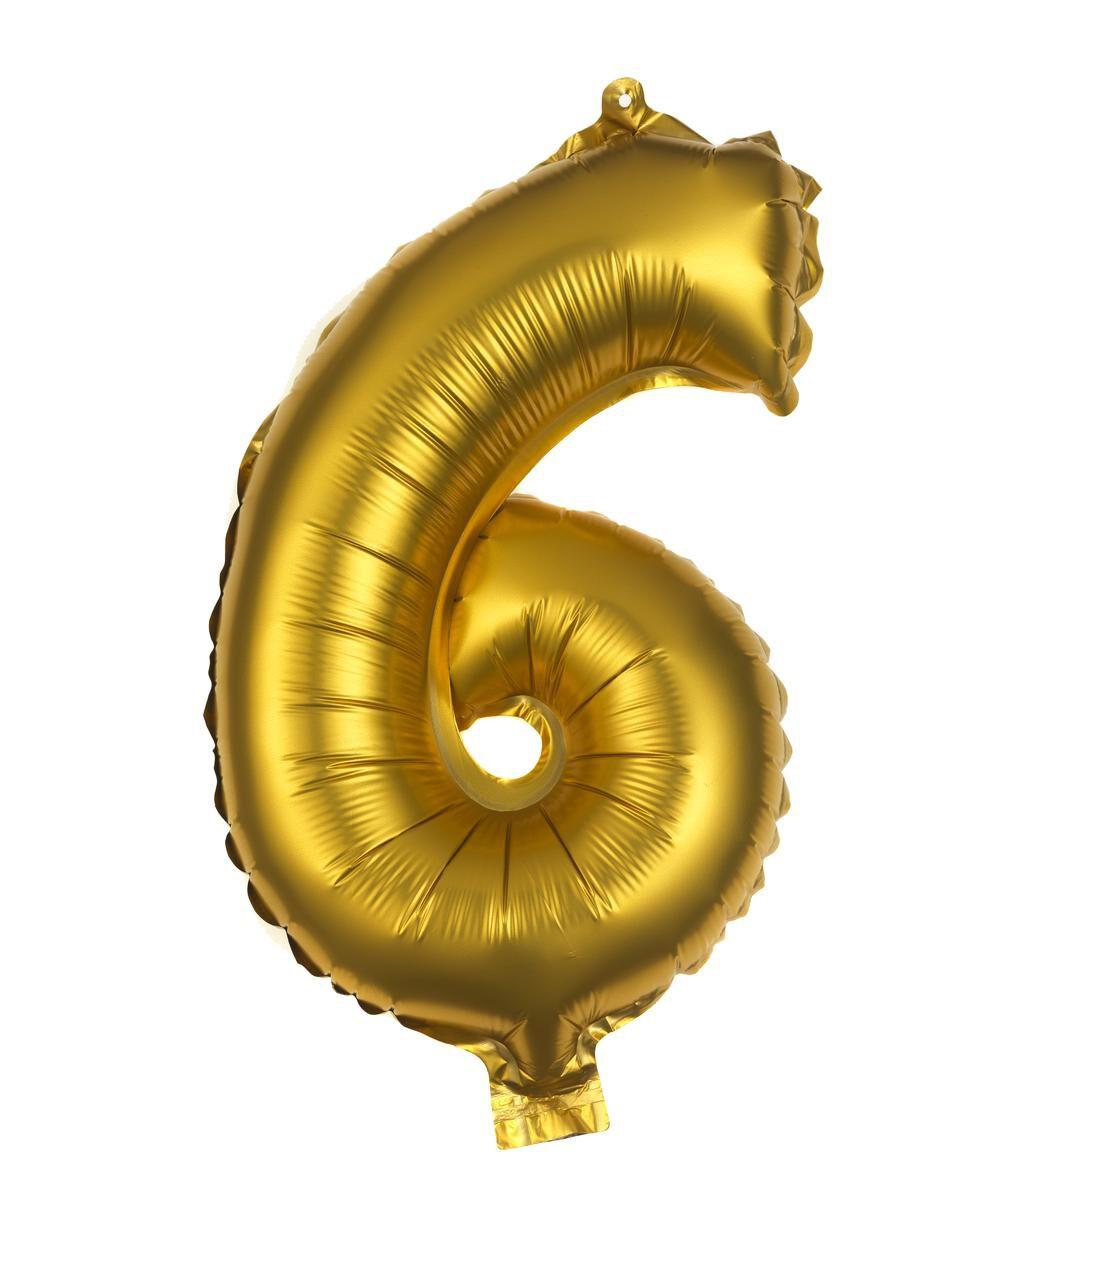 HEMA Folie Ballon 6 (goud)